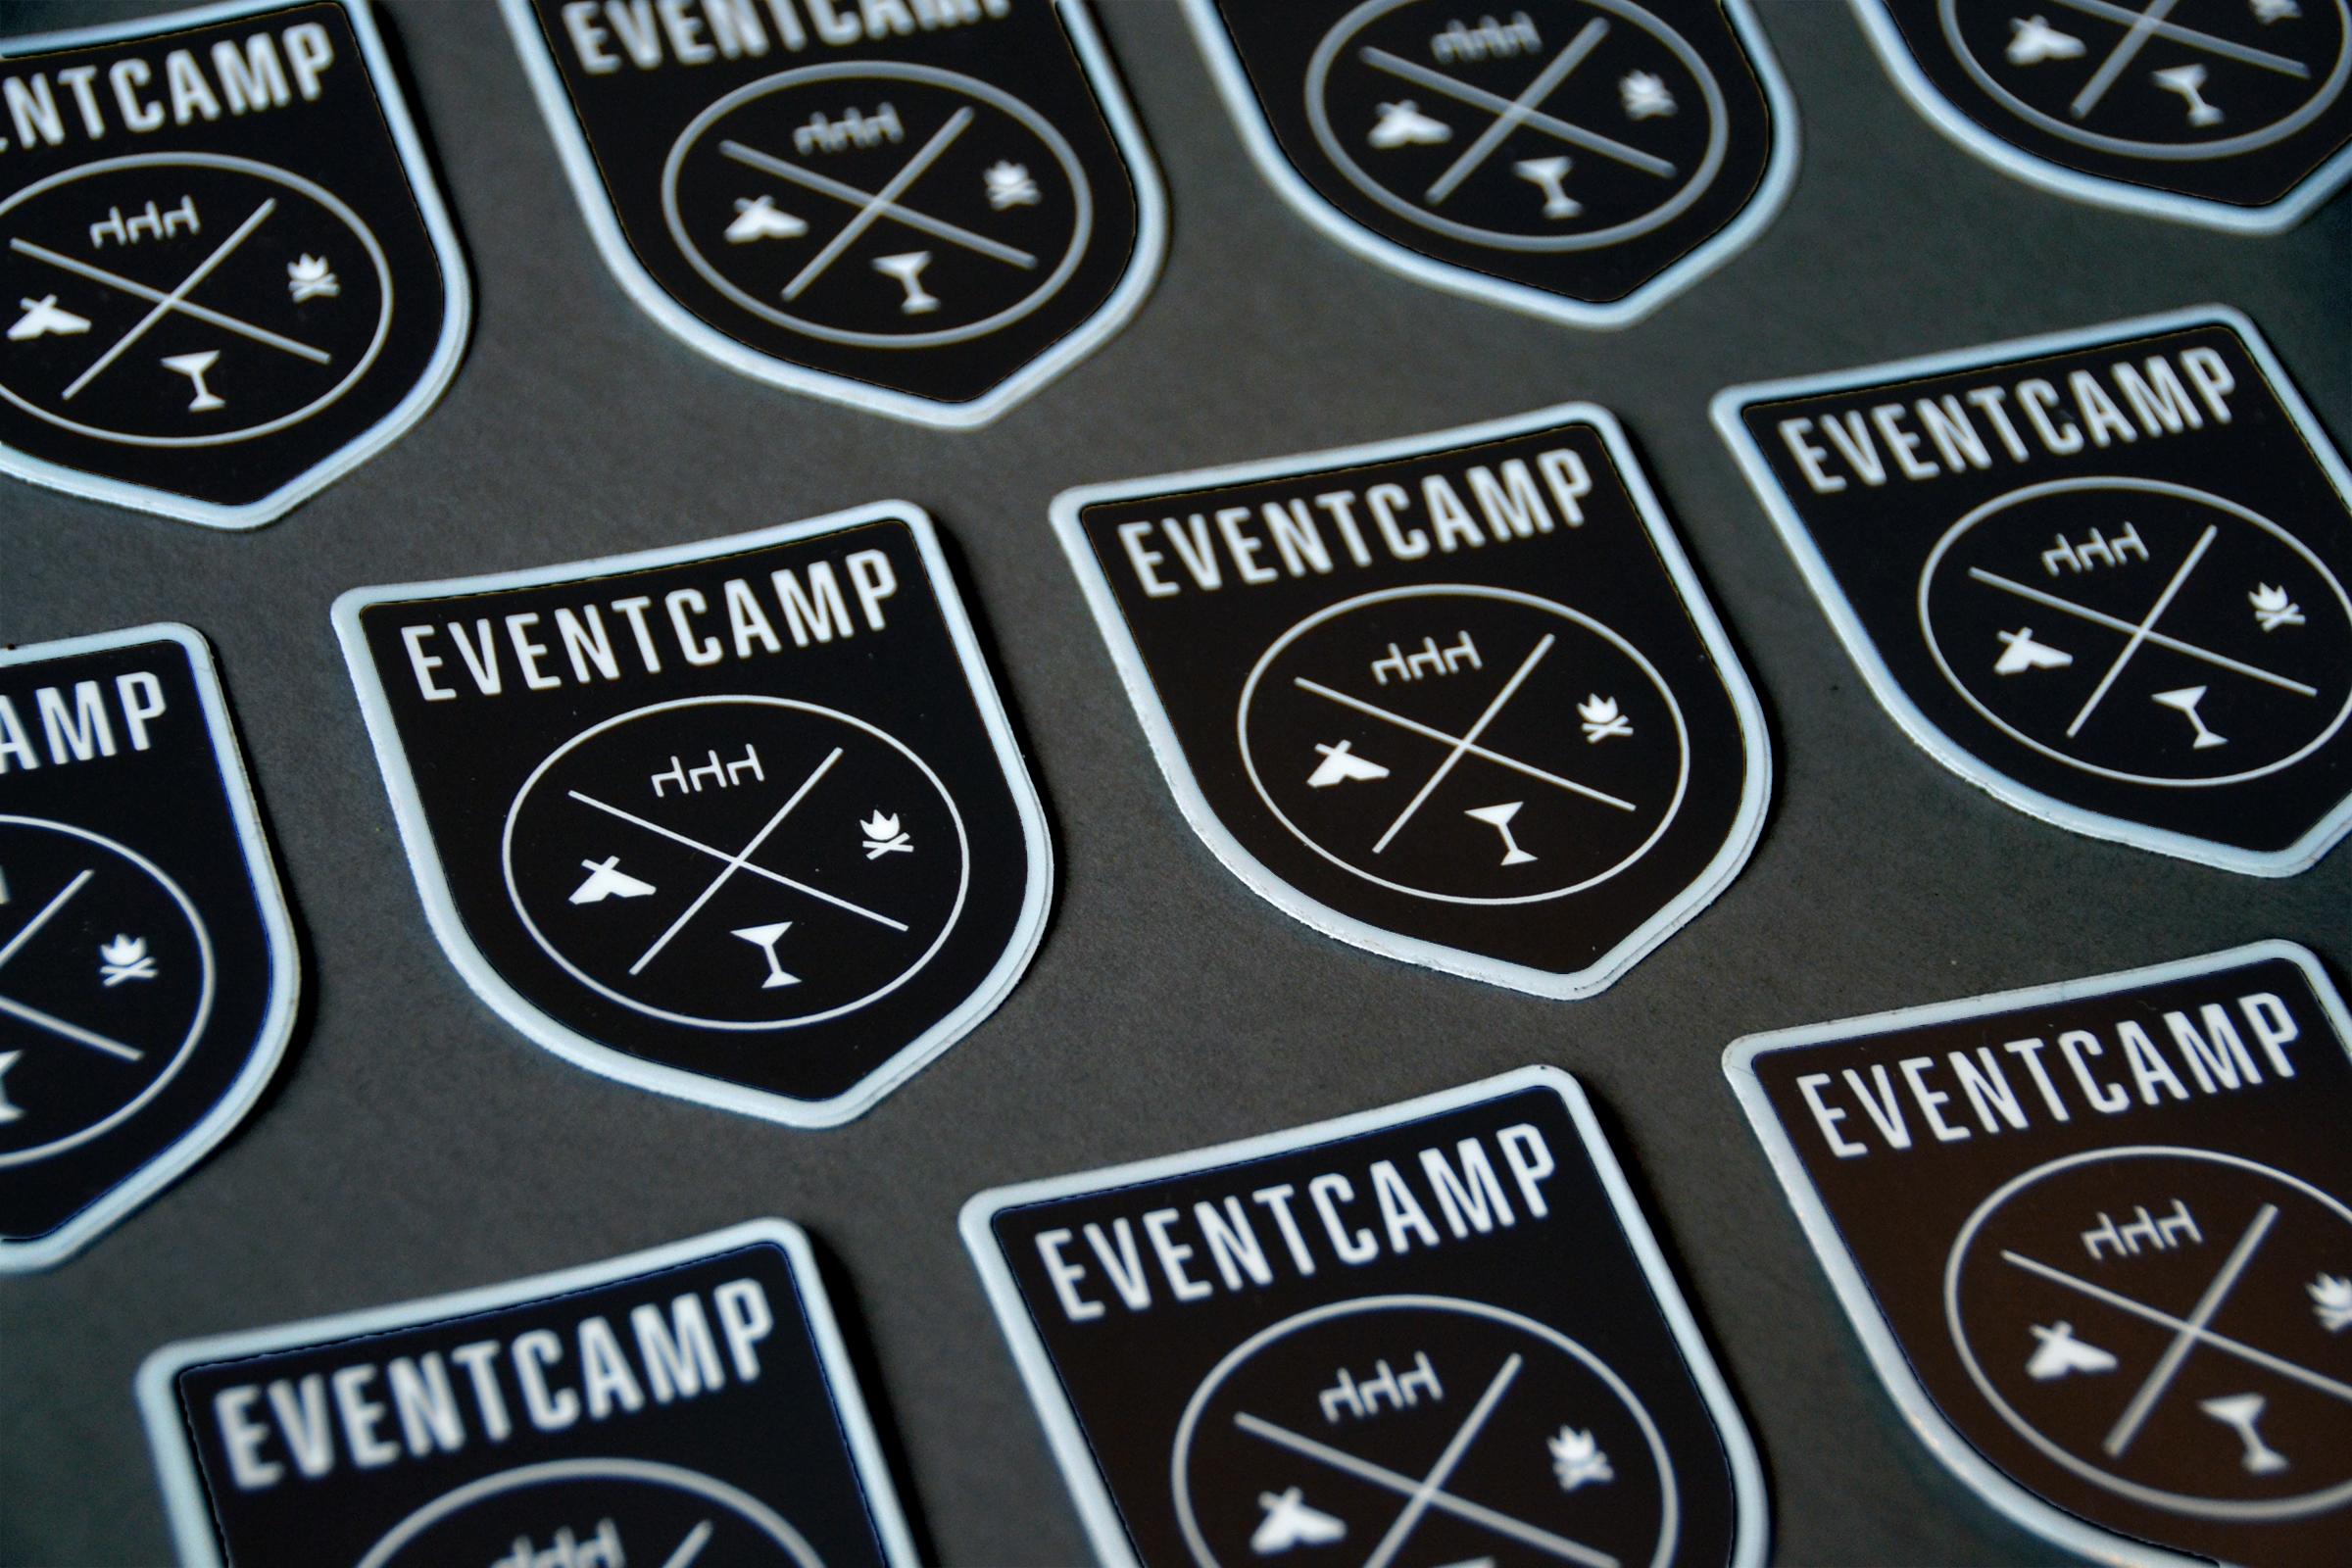 CampSticker-web-black.jpg